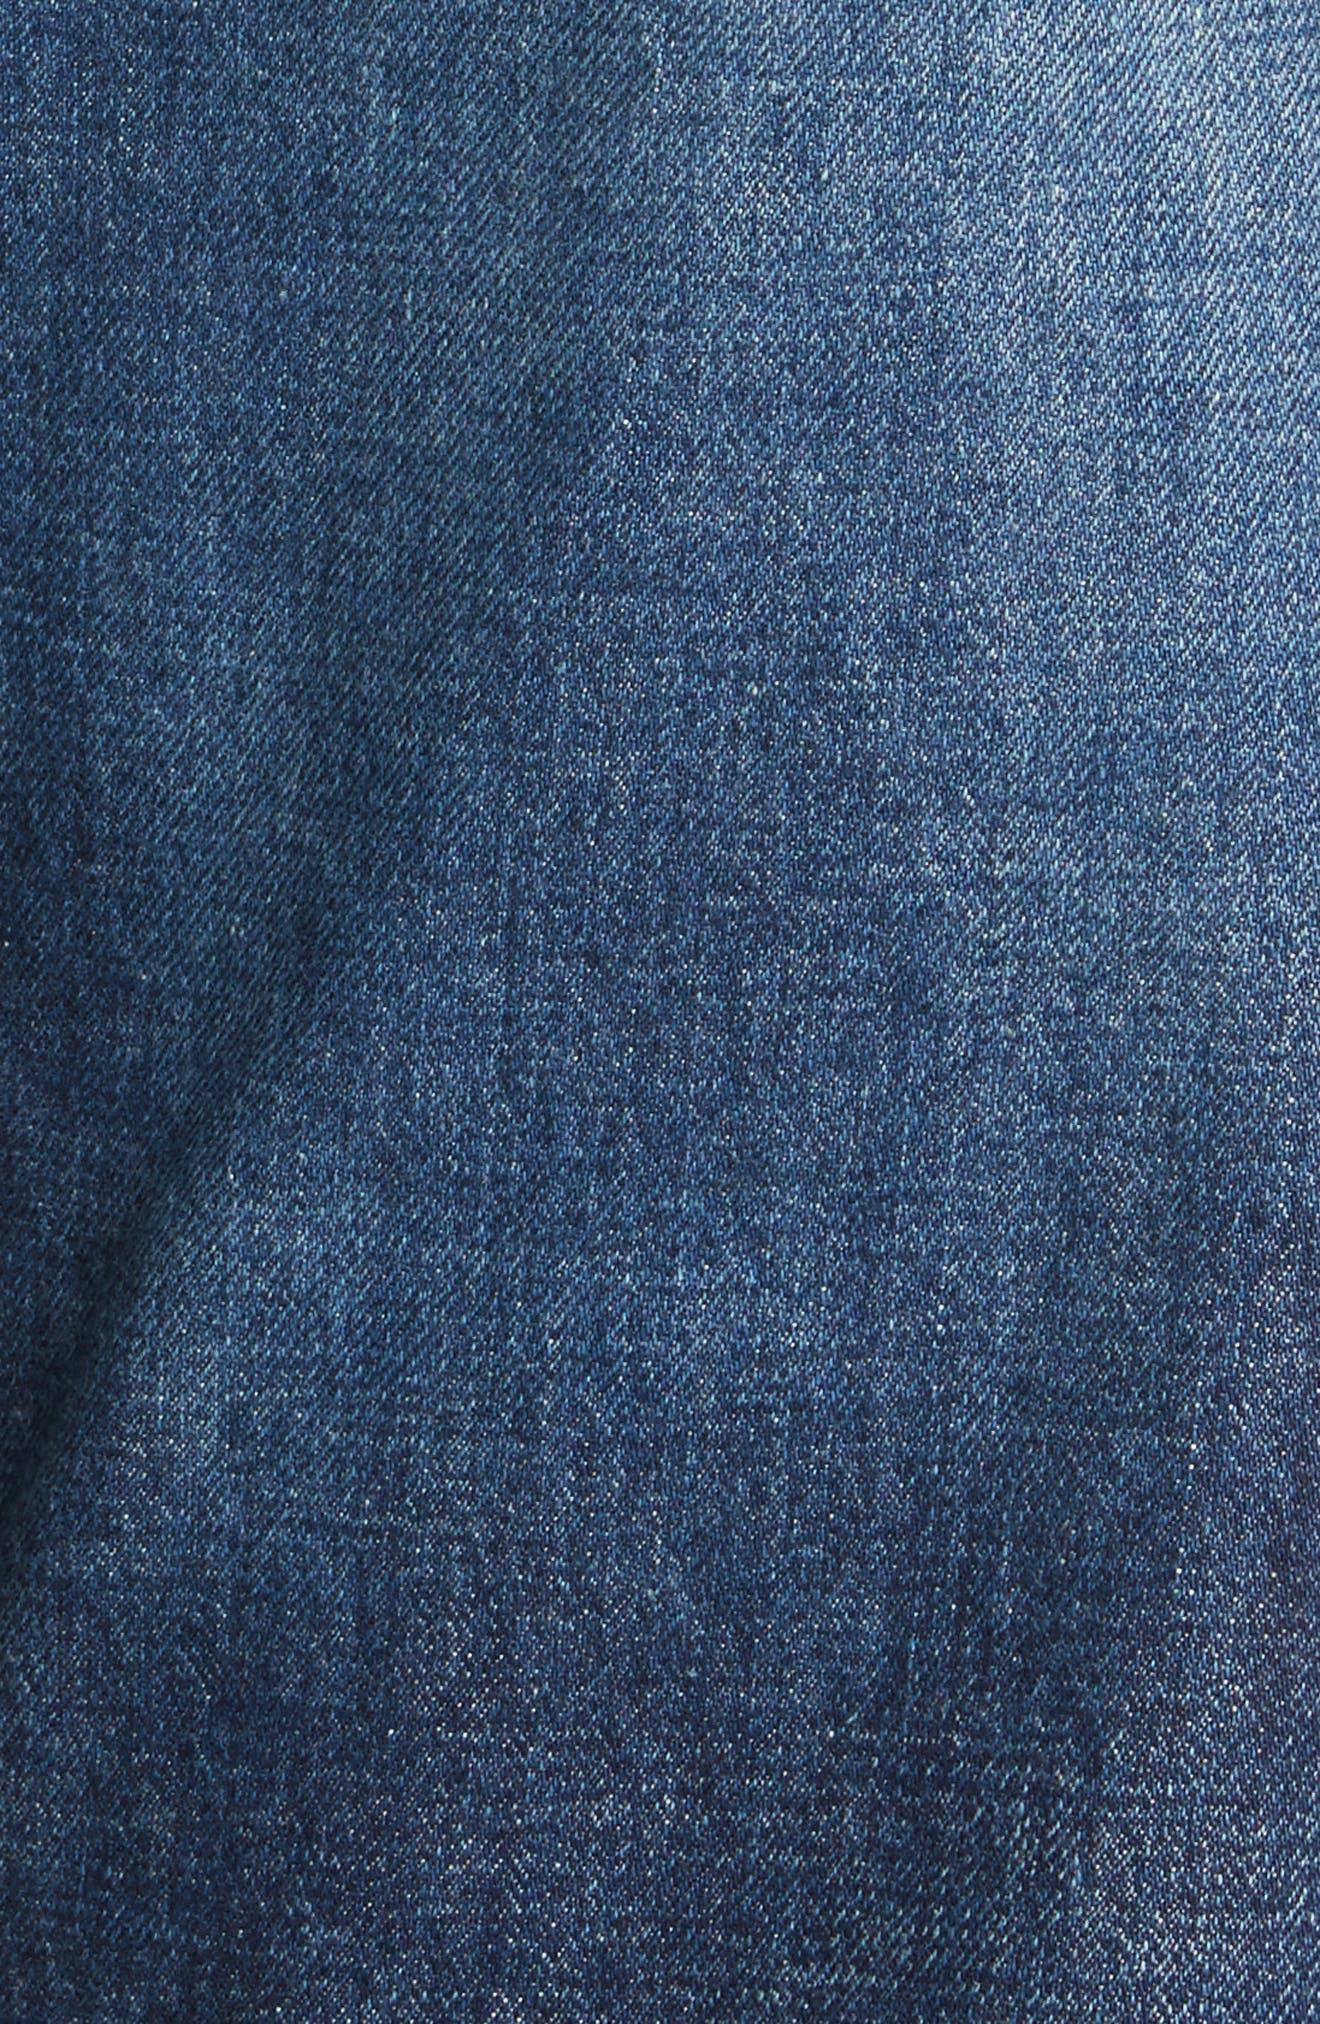 Distressed Patch Jeans,                             Alternate thumbnail 5, color,                             Indigo X Mix